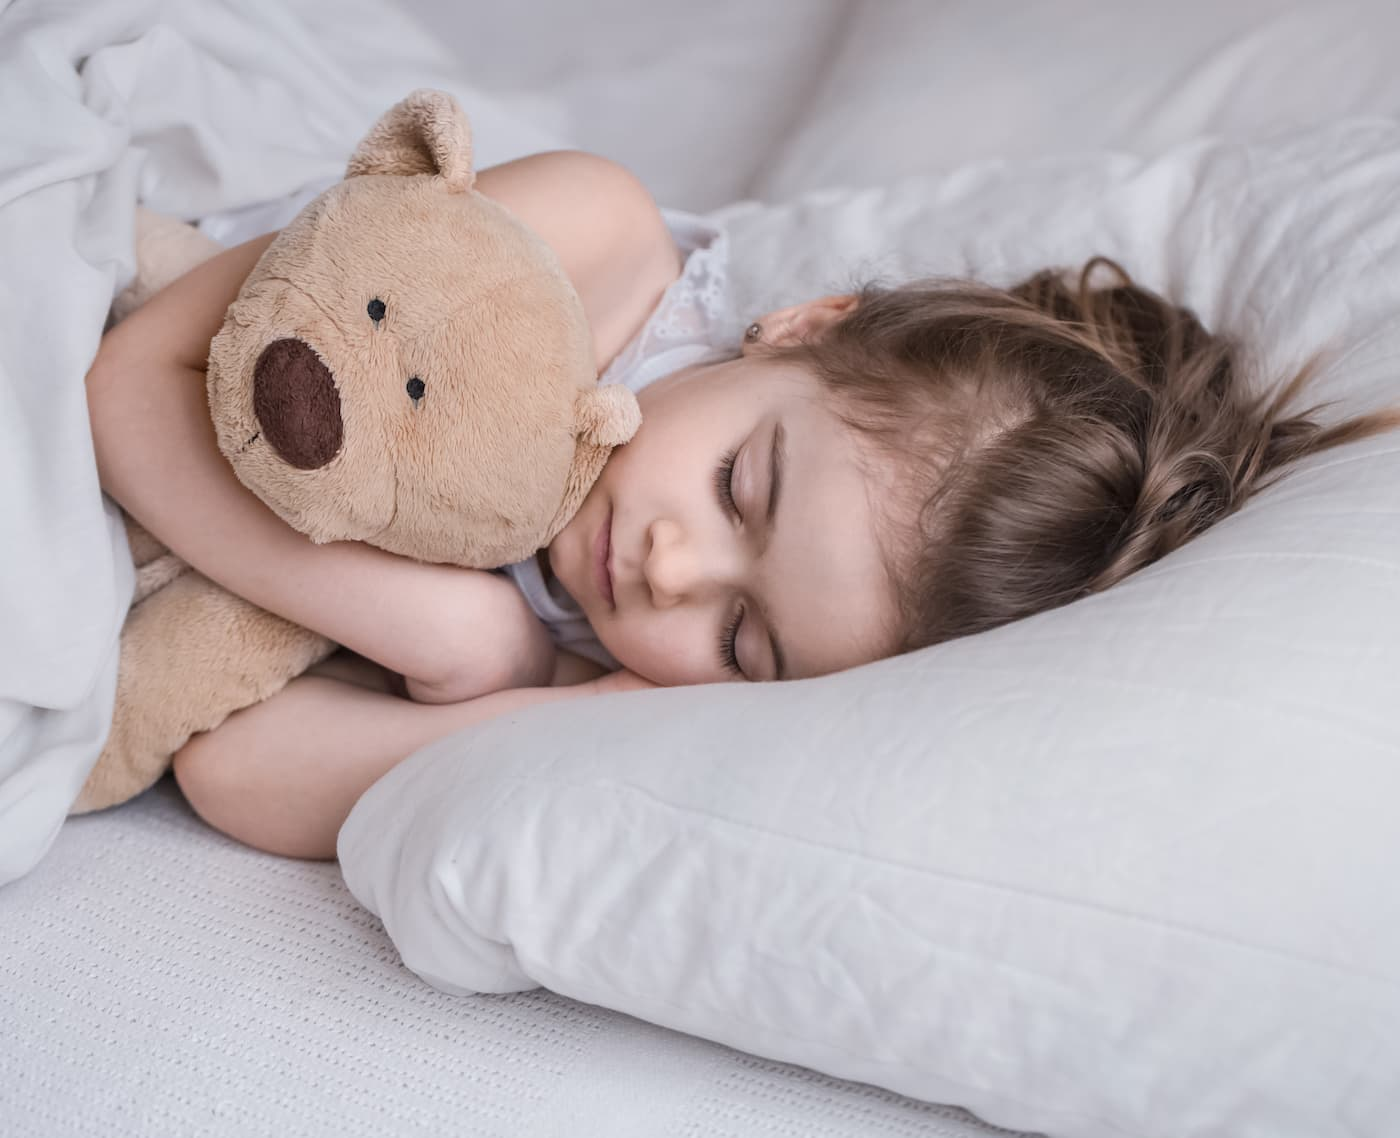 A cute child sleeping